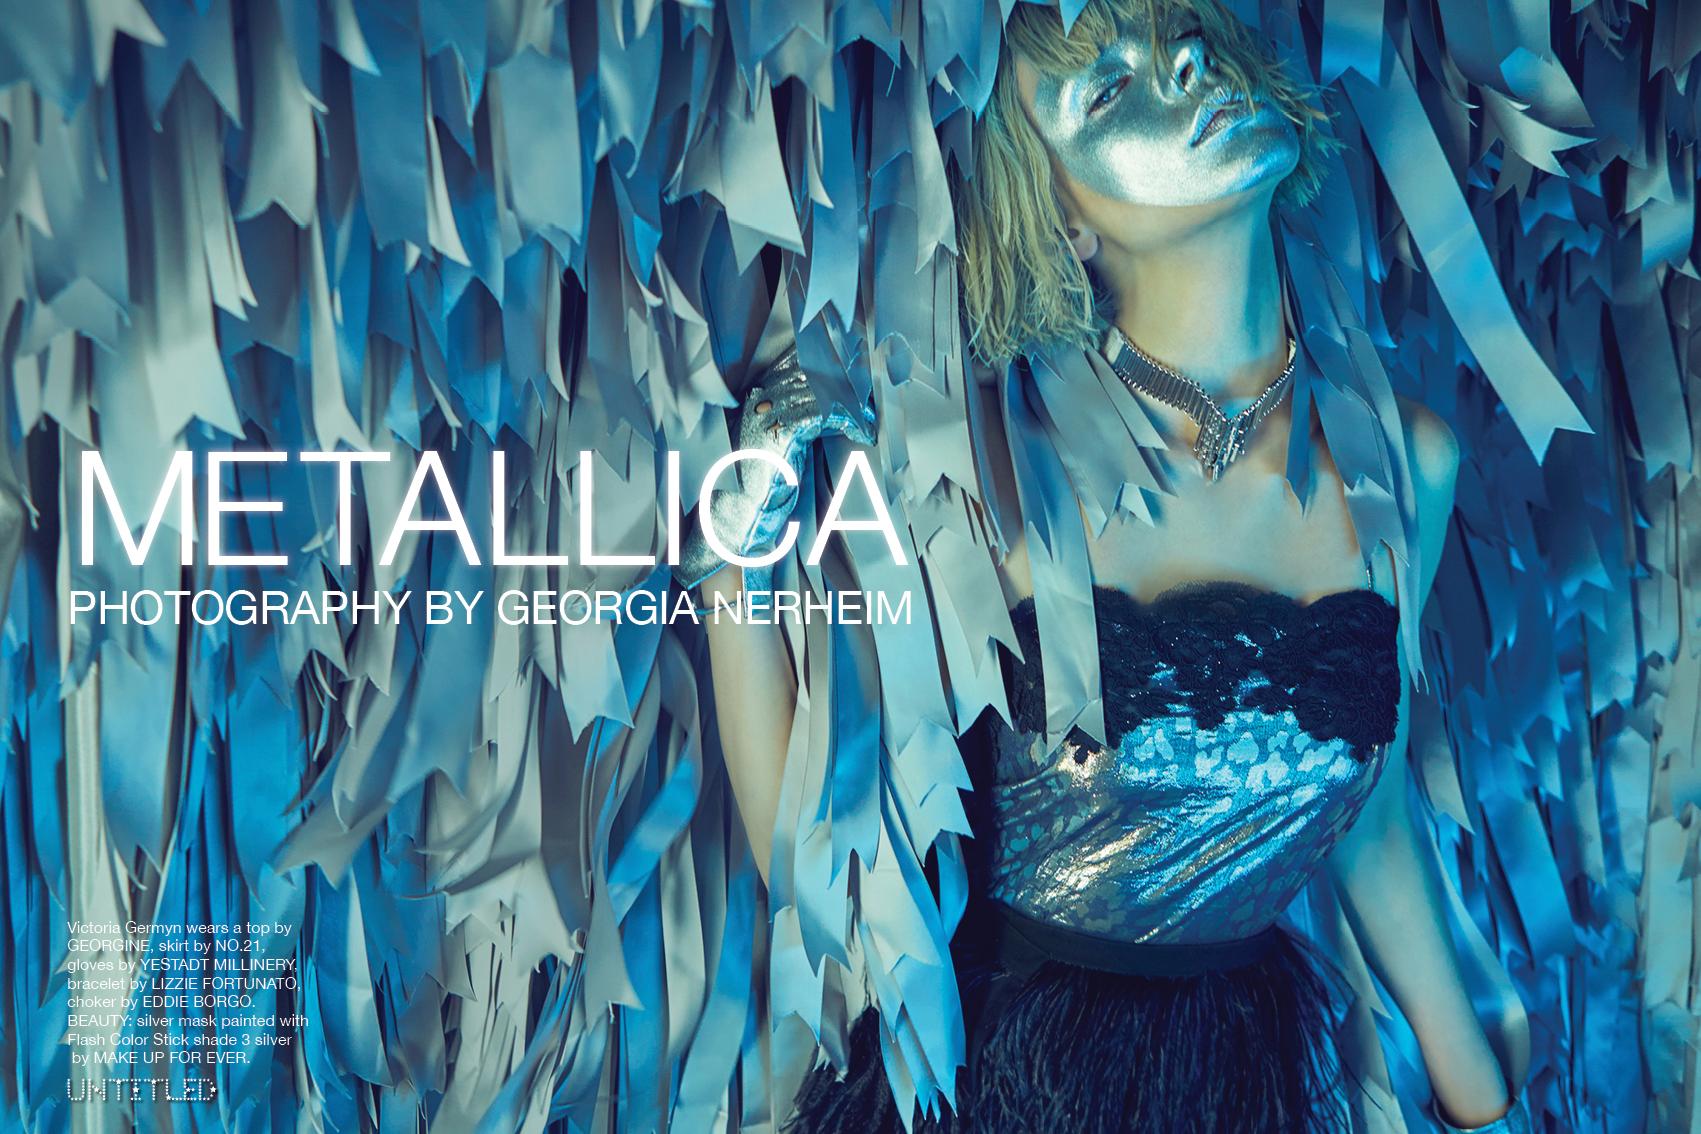 METALLICA - The Untitled Magazine - Photography by Georgia Nerheim 1.jpg